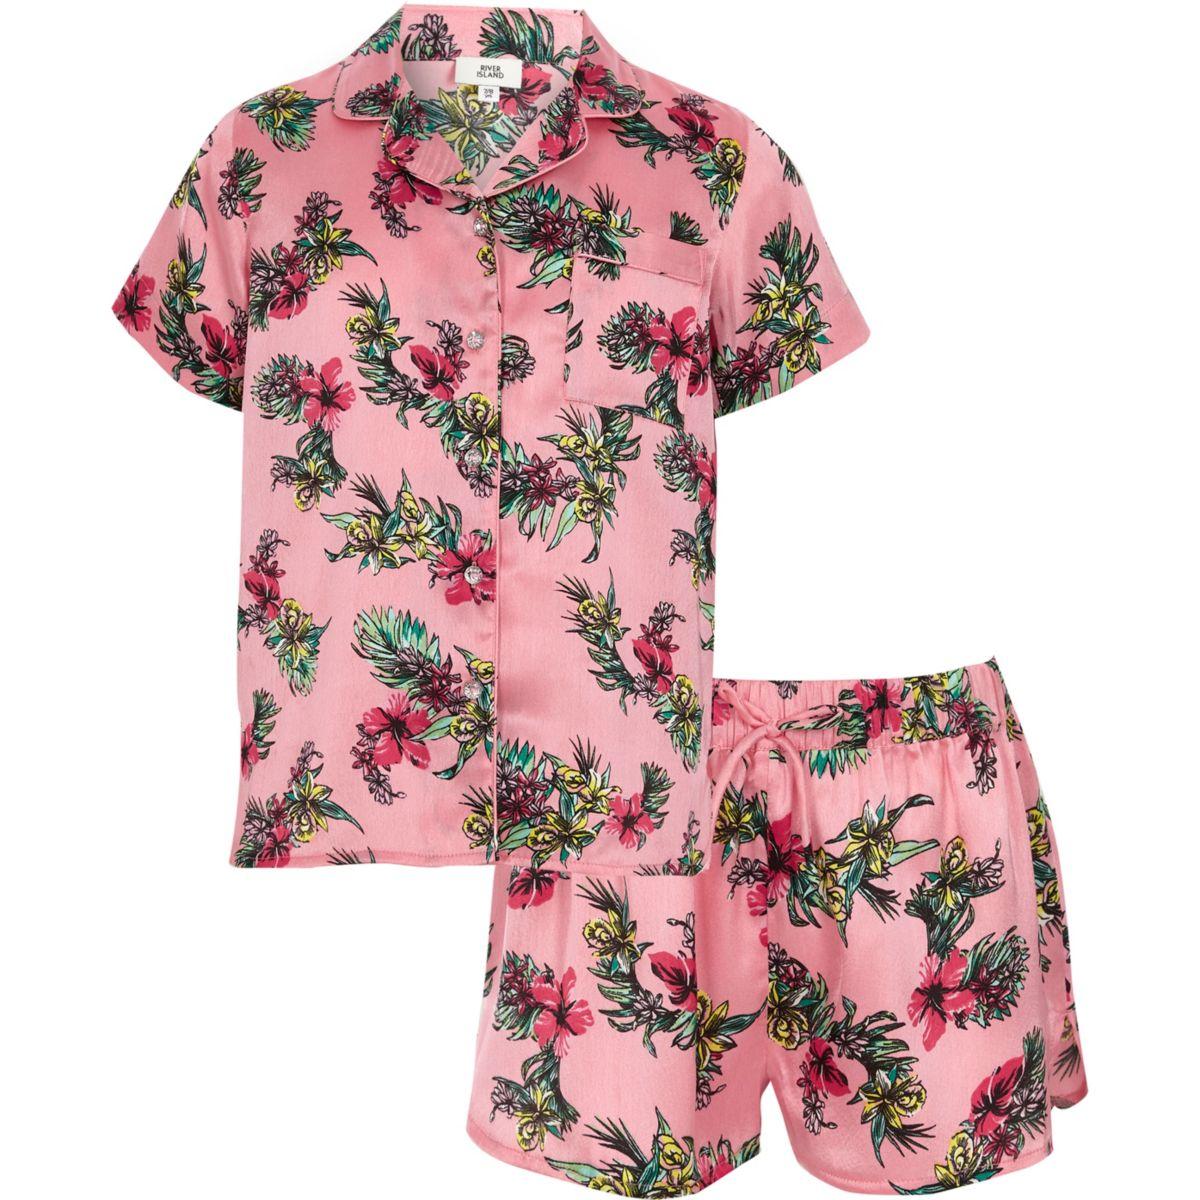 Pinkes Pyjama-Set aus Satin